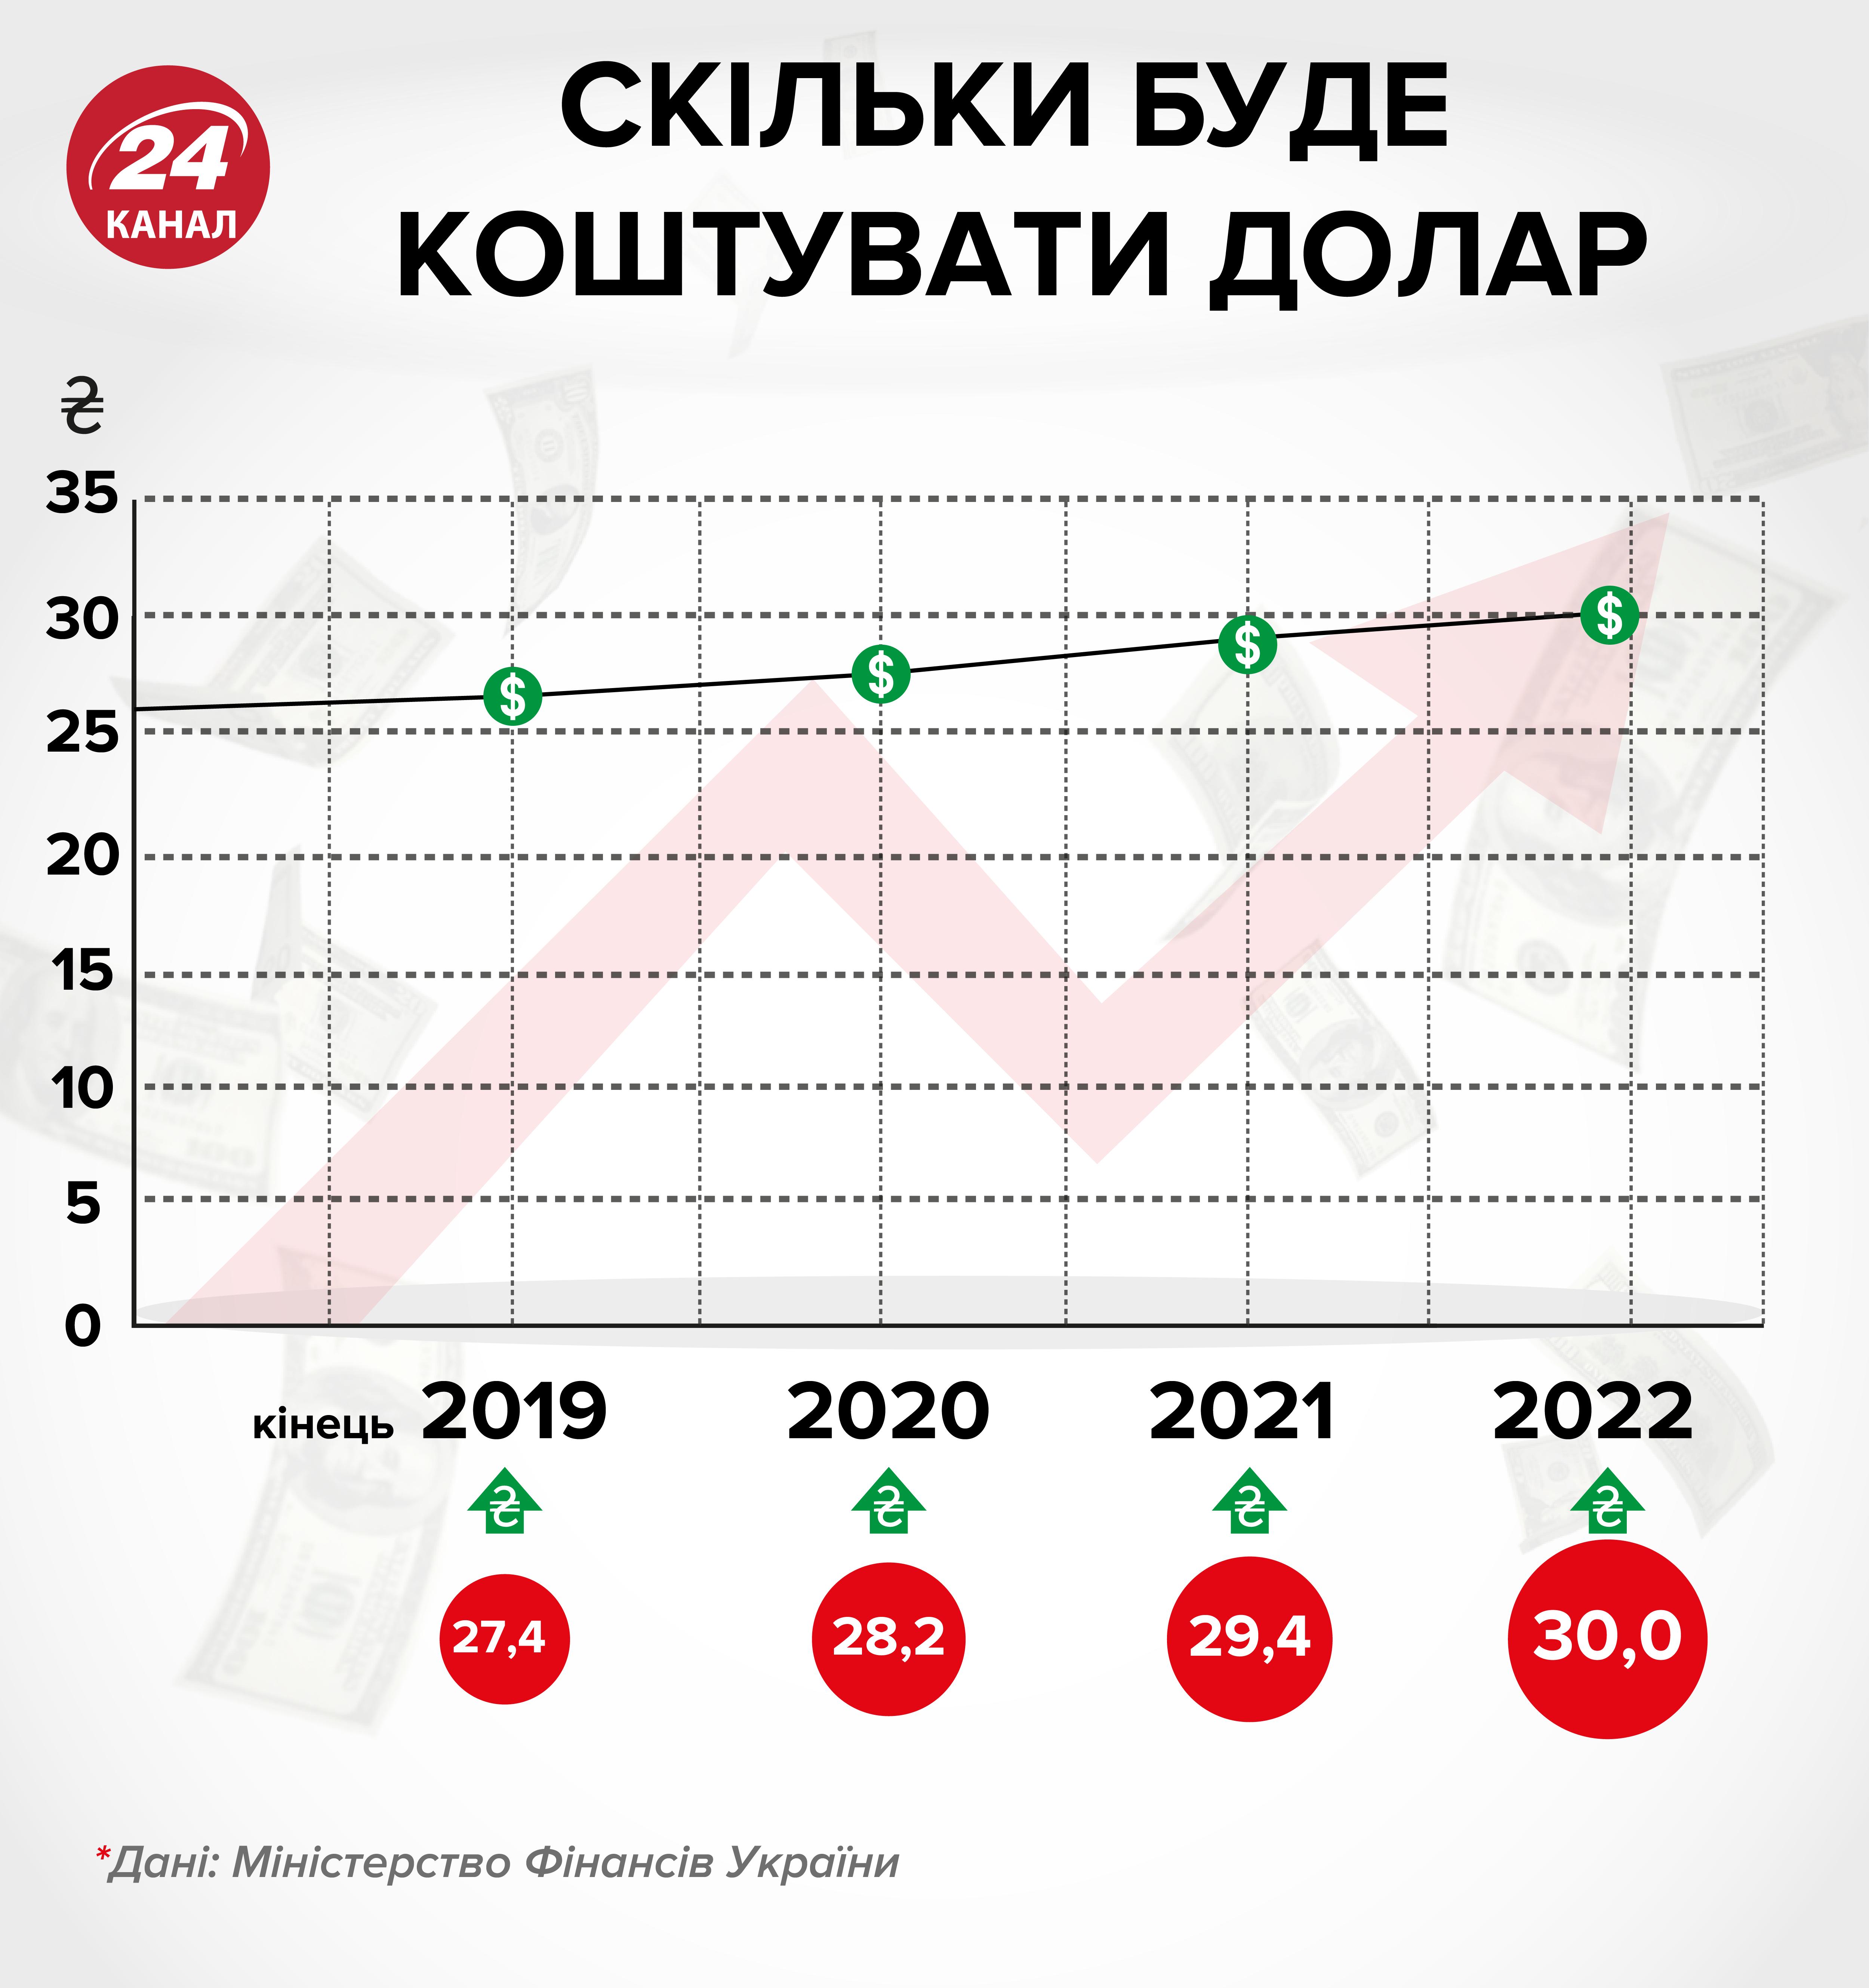 прогноз курсу долара до 2022 року